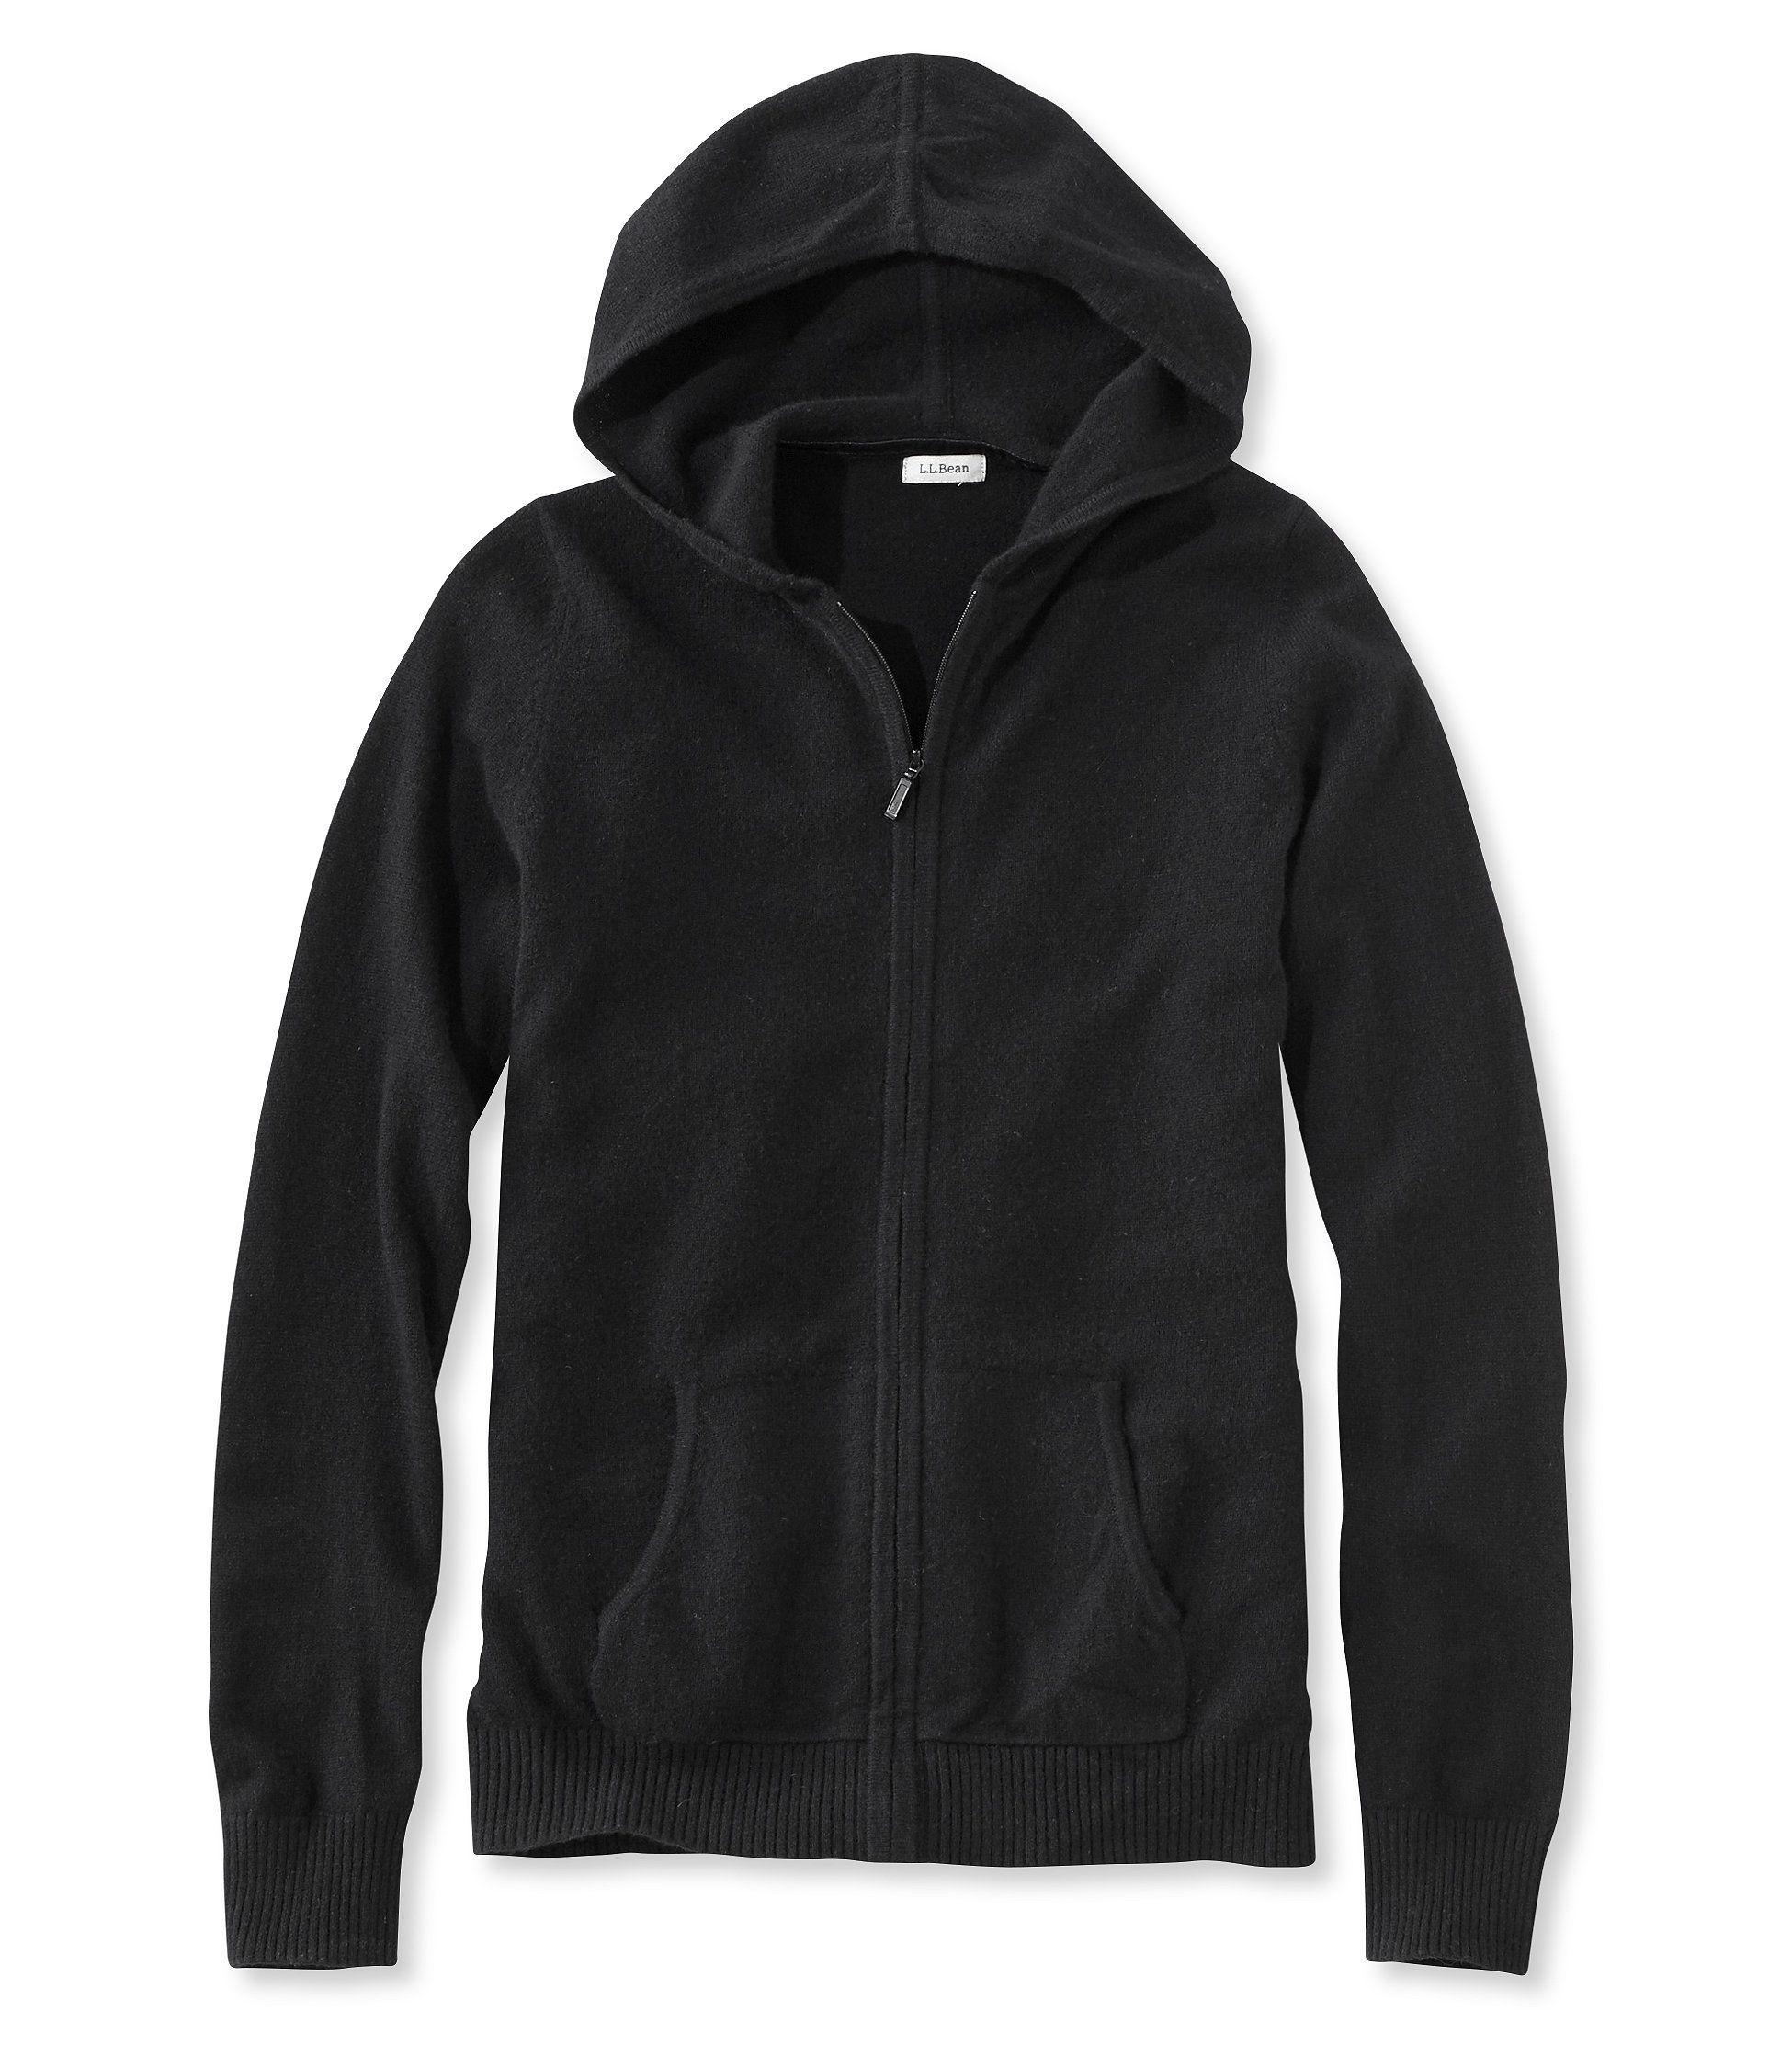 f7ced24b8 Terra SPEED Men s Black Cotton Canvas Jacket